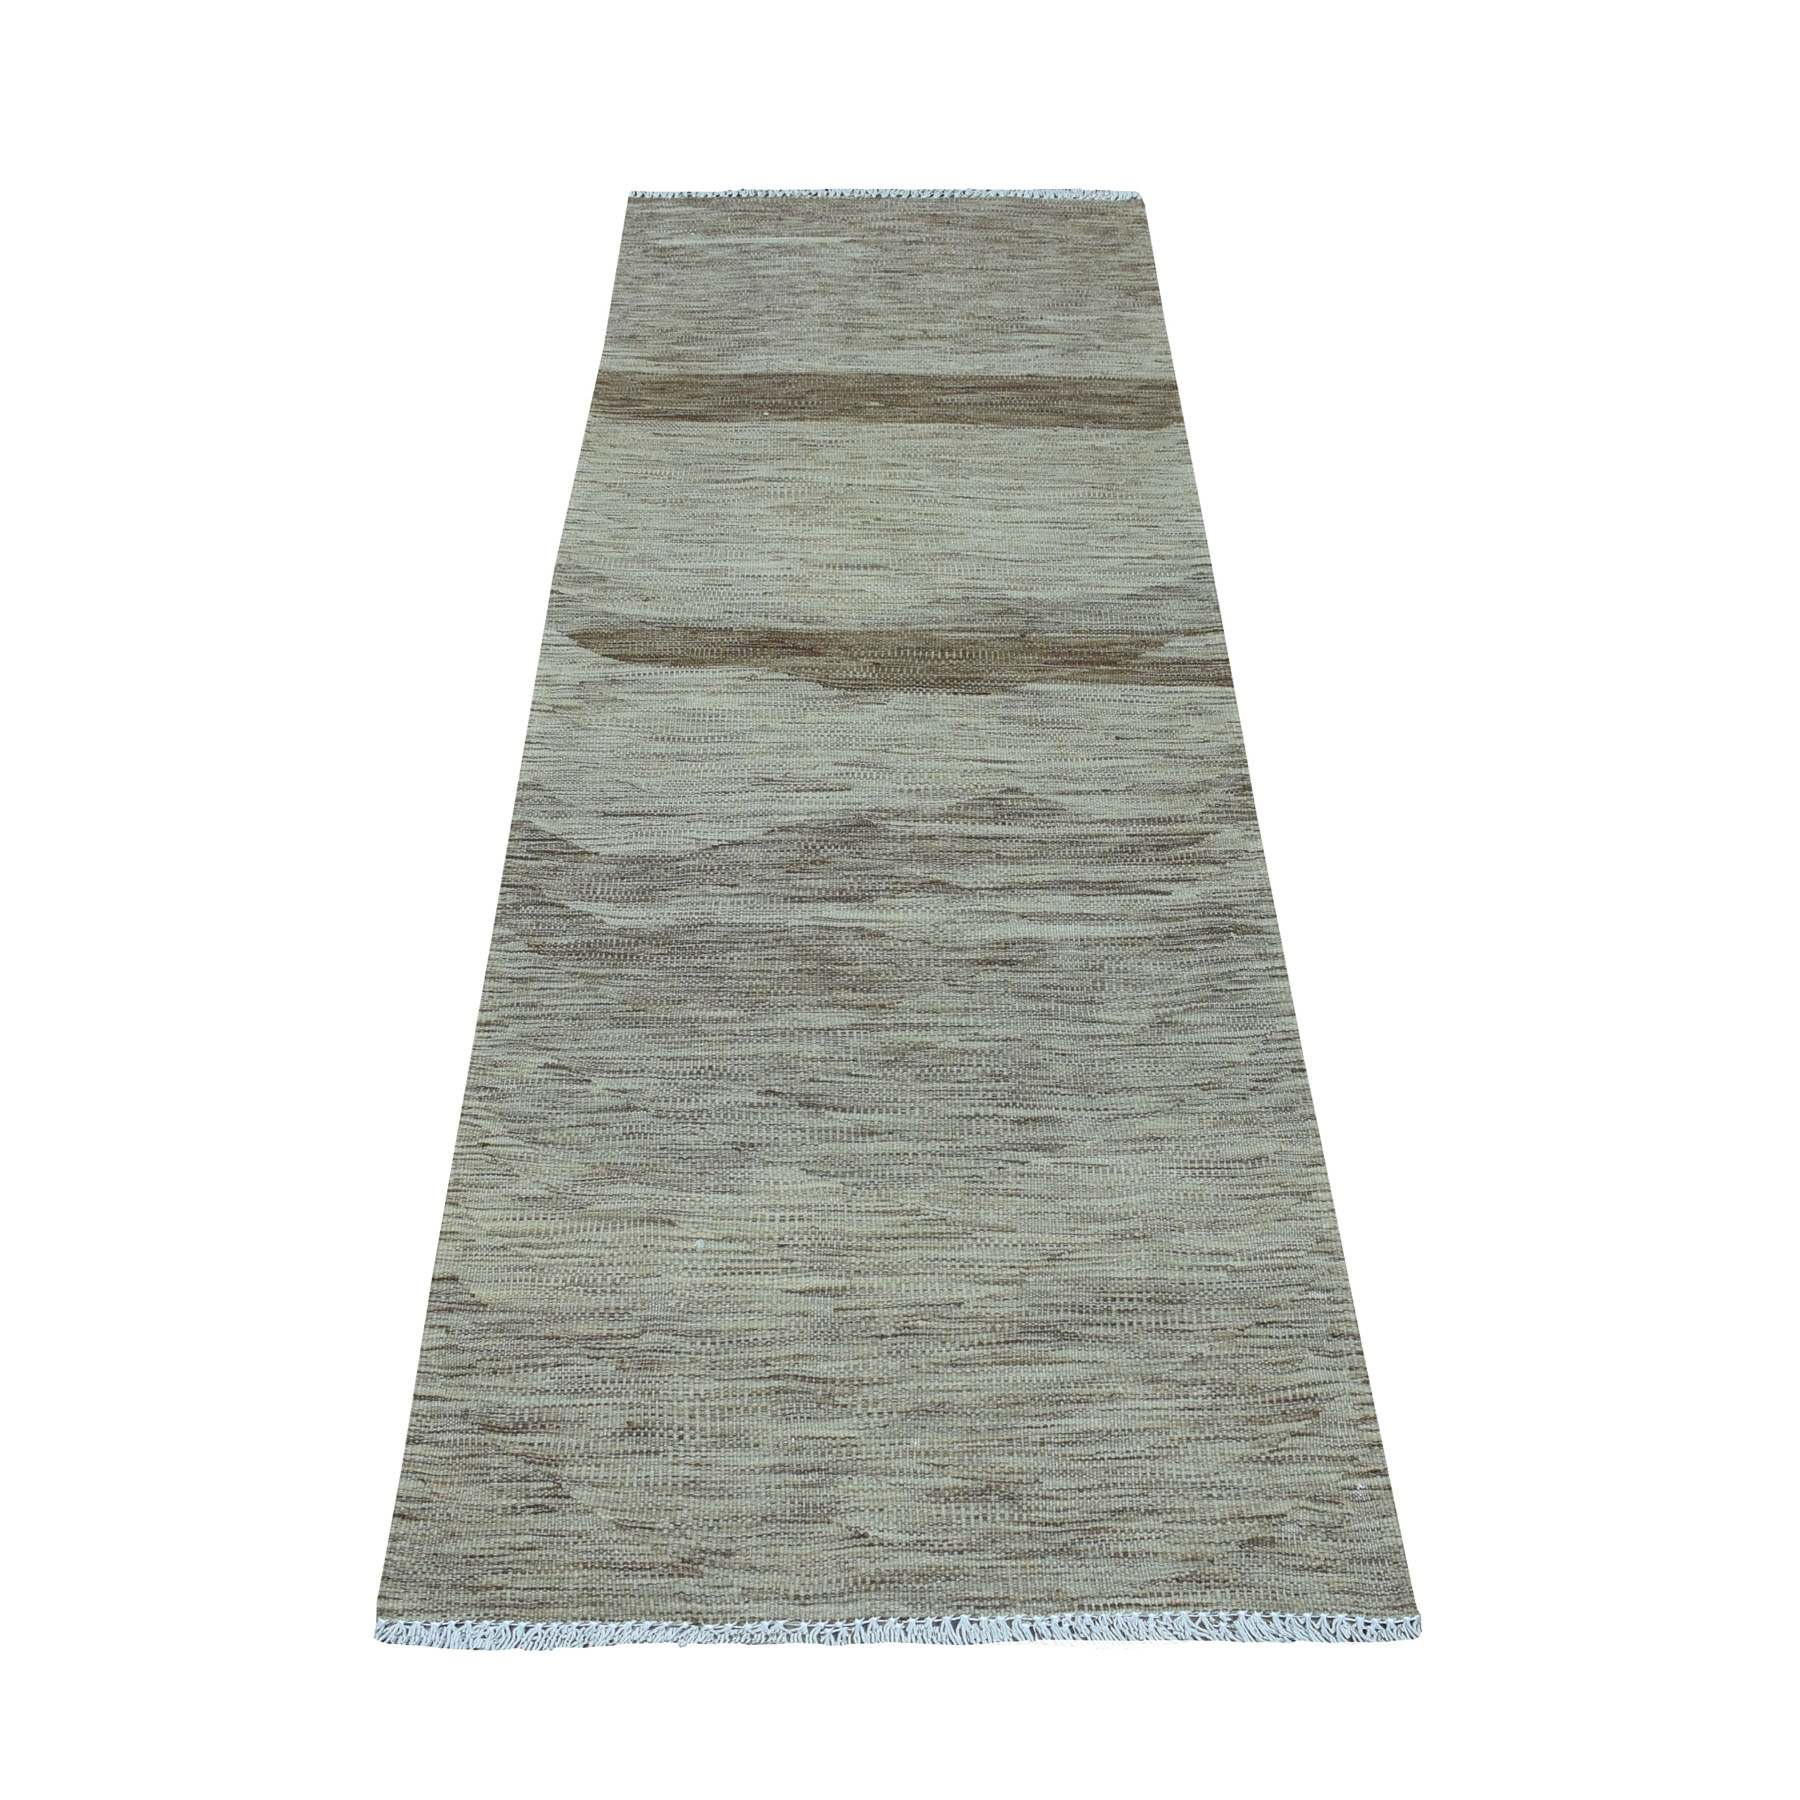 Fine Kilim Collection Hand Woven Grey Rug No: 01108502